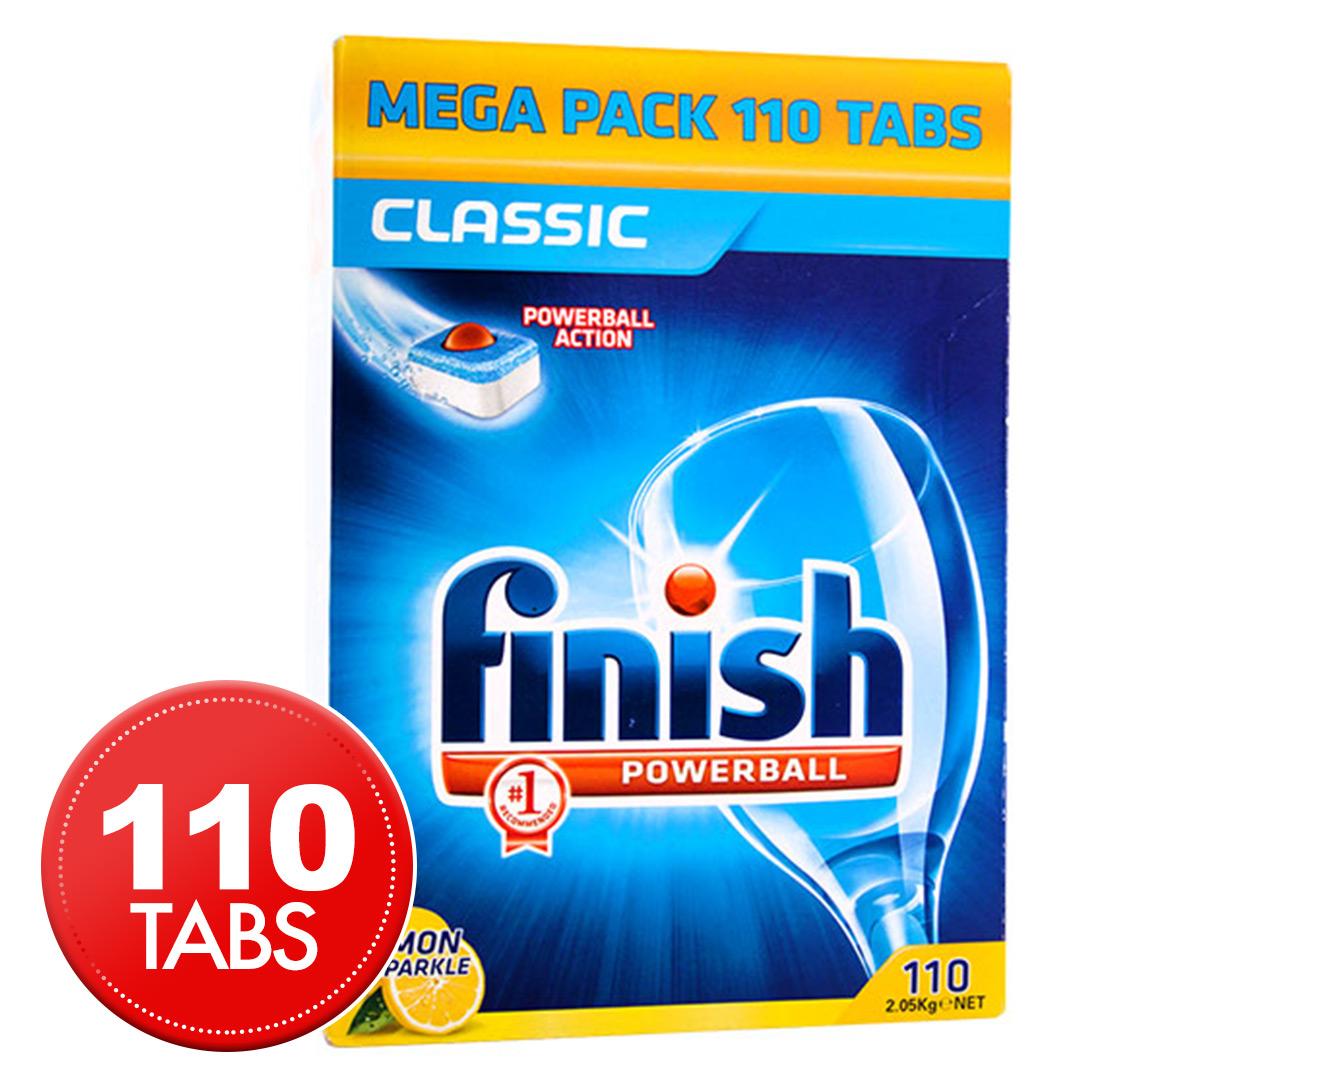 Finish Powerball Dishwashing Tabs Classic Lemon Sparkle 110pk Great Daily Deals At Australia S